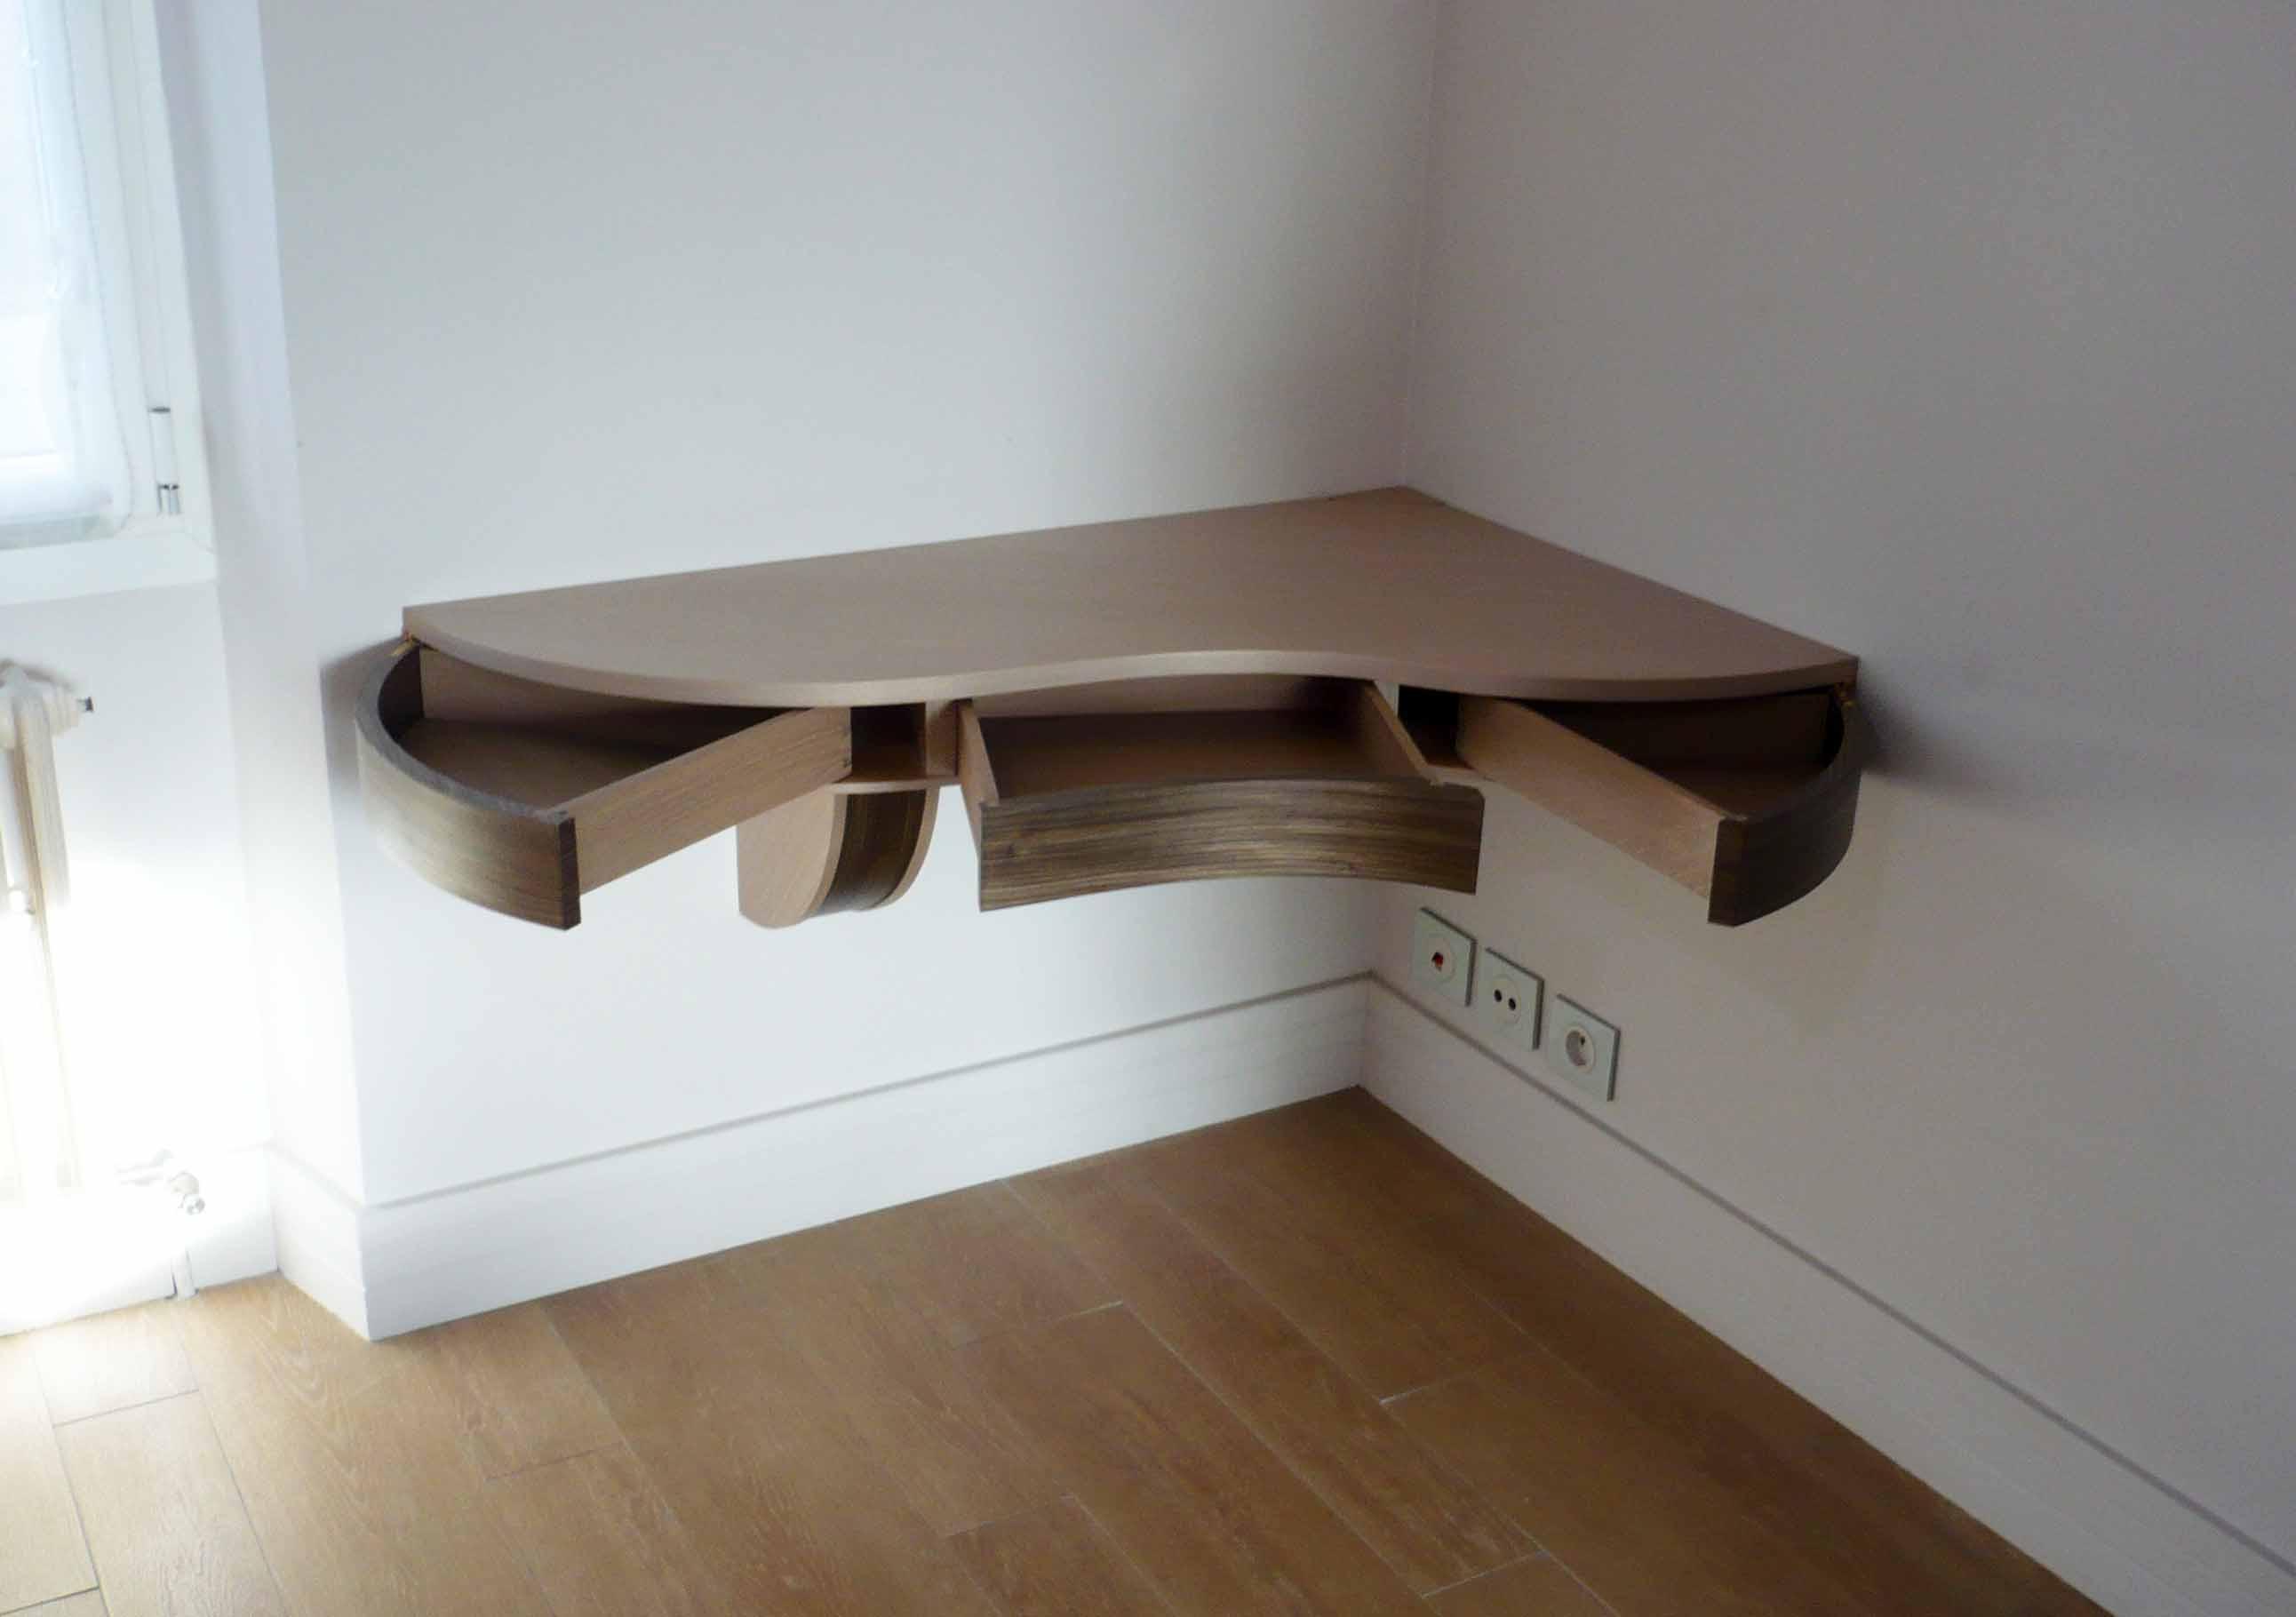 fabricant de mobilier contemporain